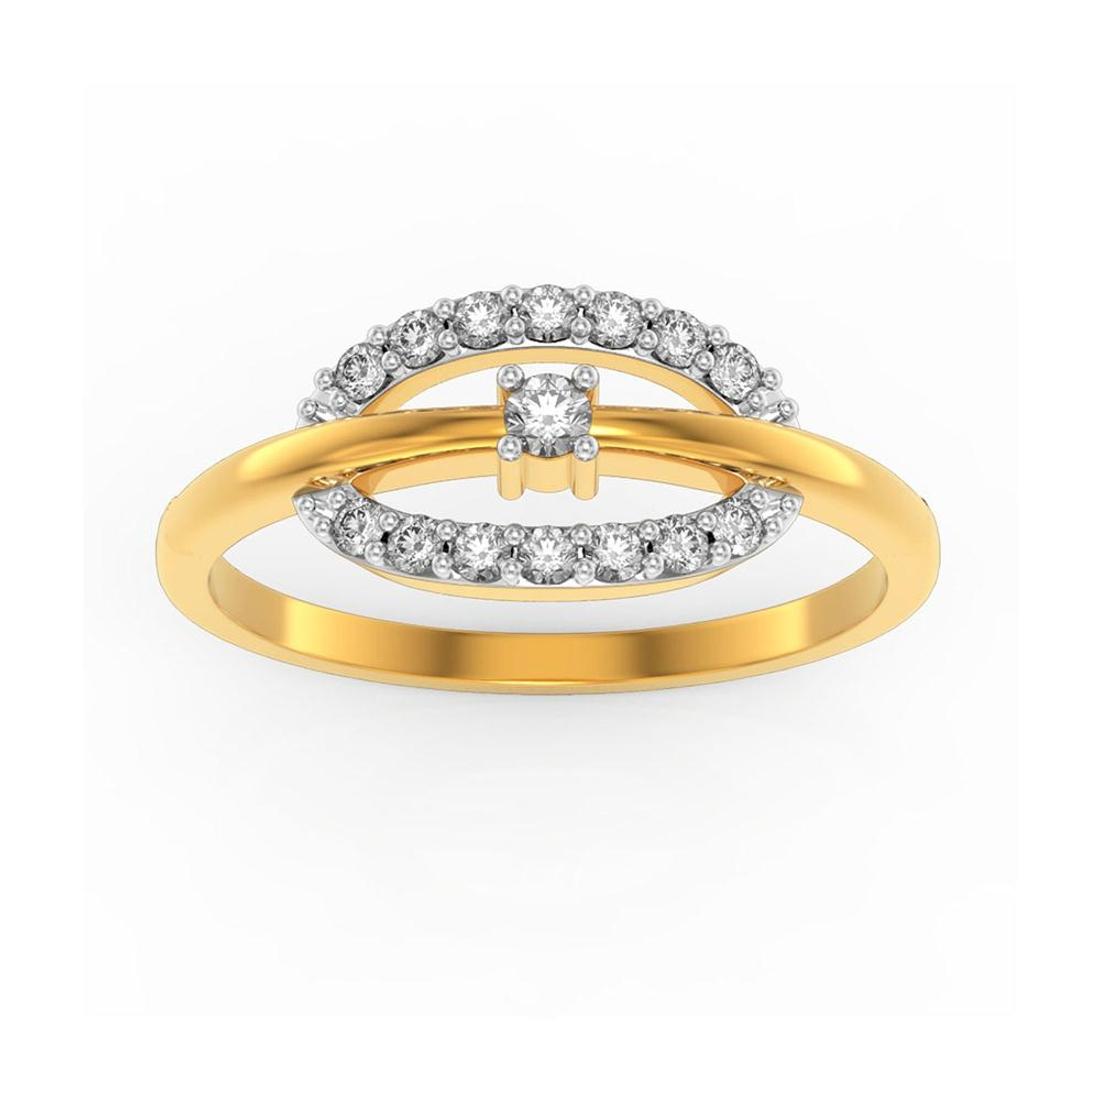 Buy Charu Jewels Diamond Ladies Ring CJLR0373 Online in India